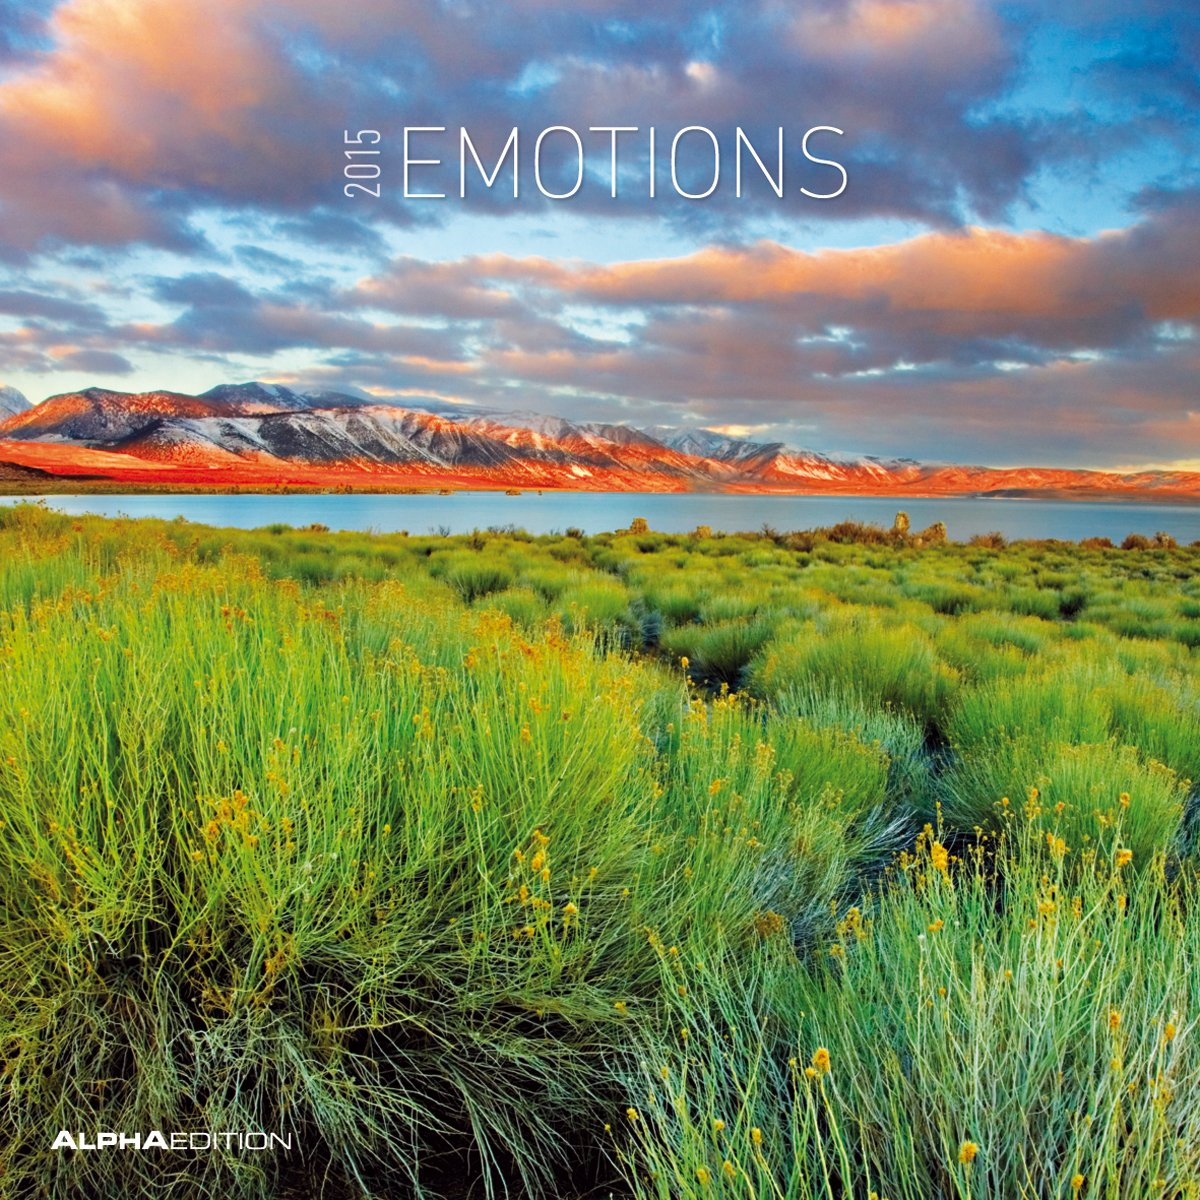 Emotions 2015 - Emotionen - Broschürenkalender (30 x 60 geöffnet) - Landschaftskalender